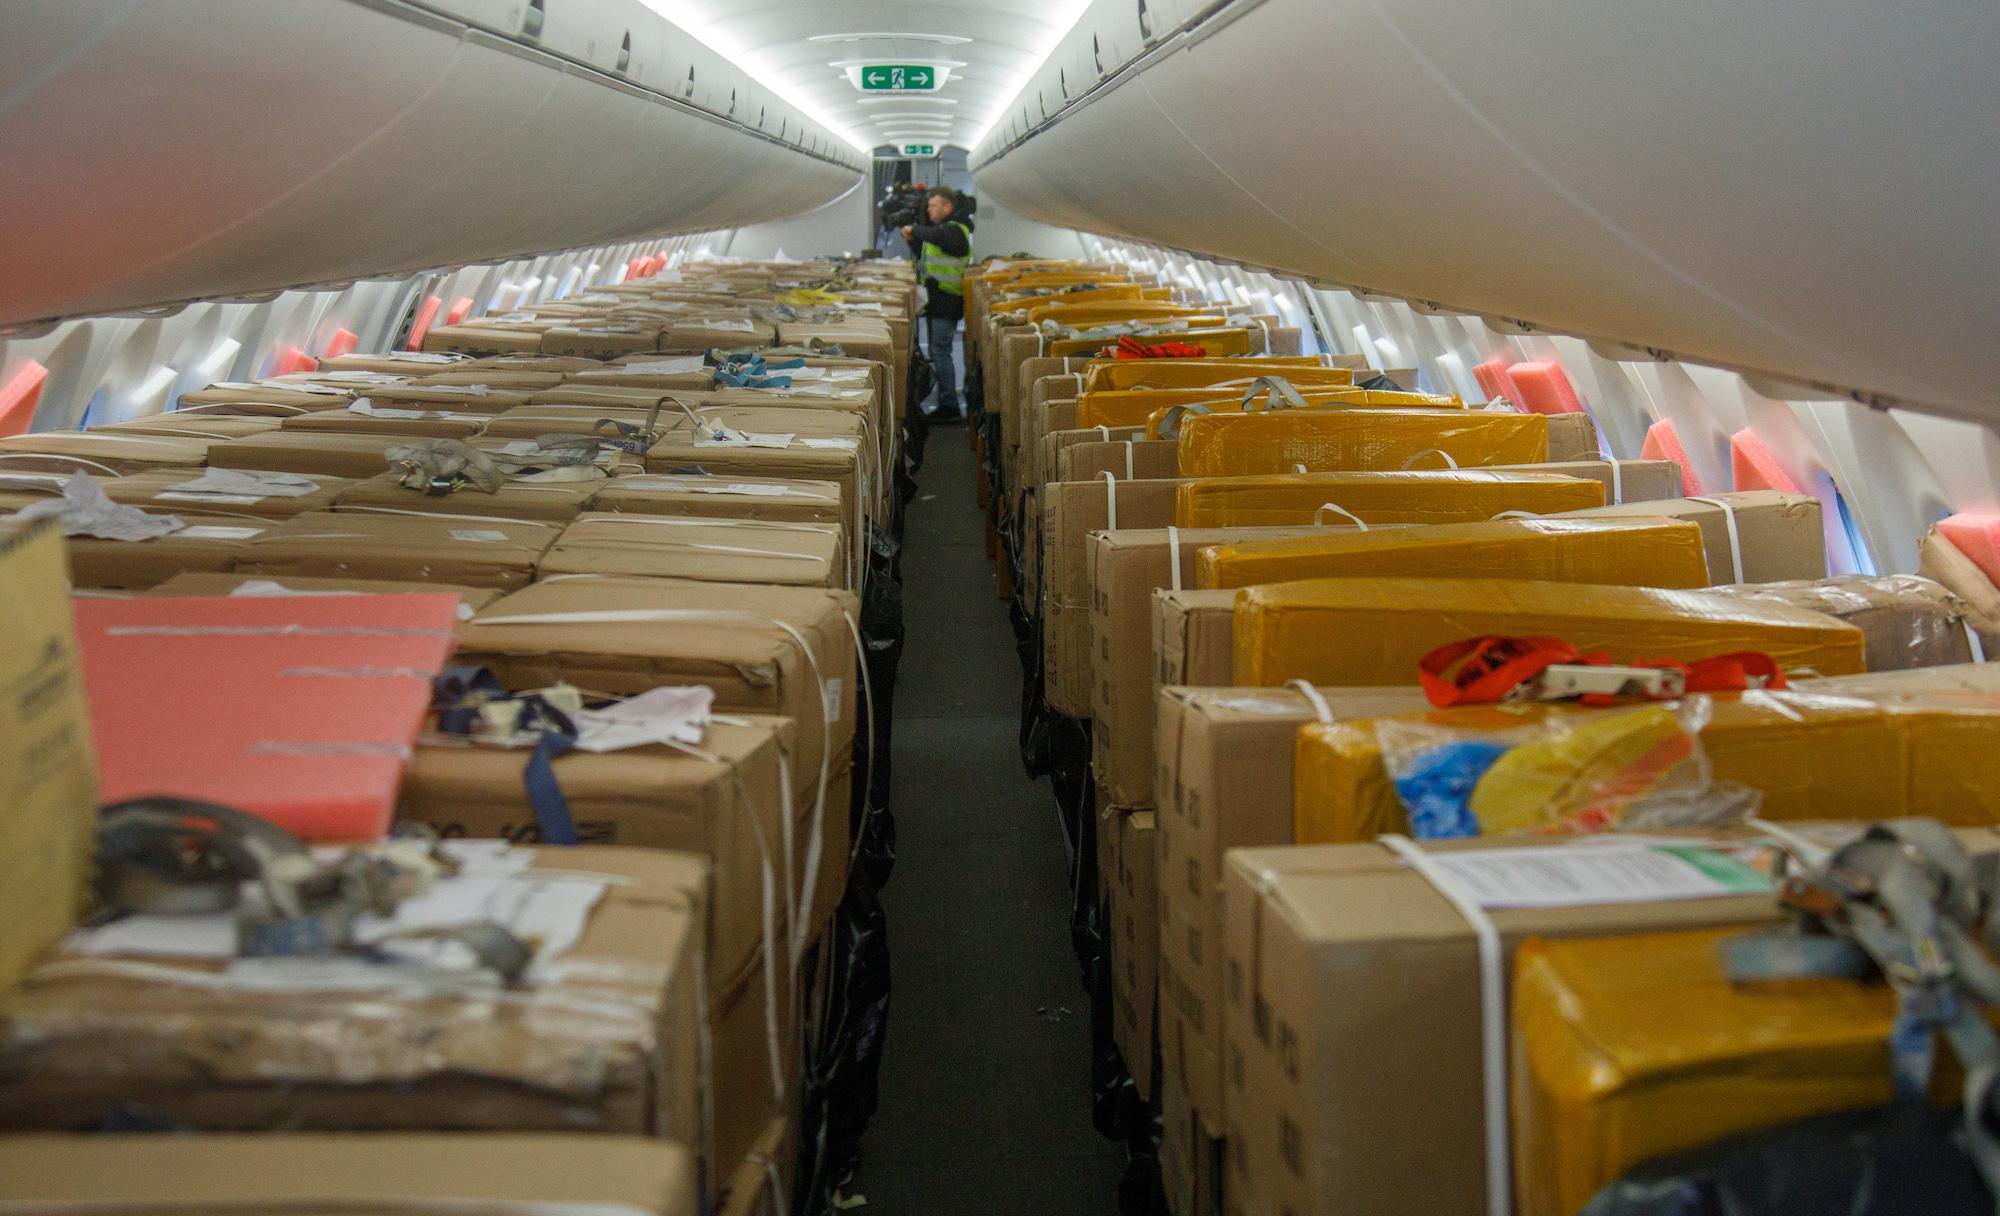 Kabinen i Airbus A220-300 fra airBaltic fyldt med medicinsk udstyr. (Foto: airBaltic | PR)